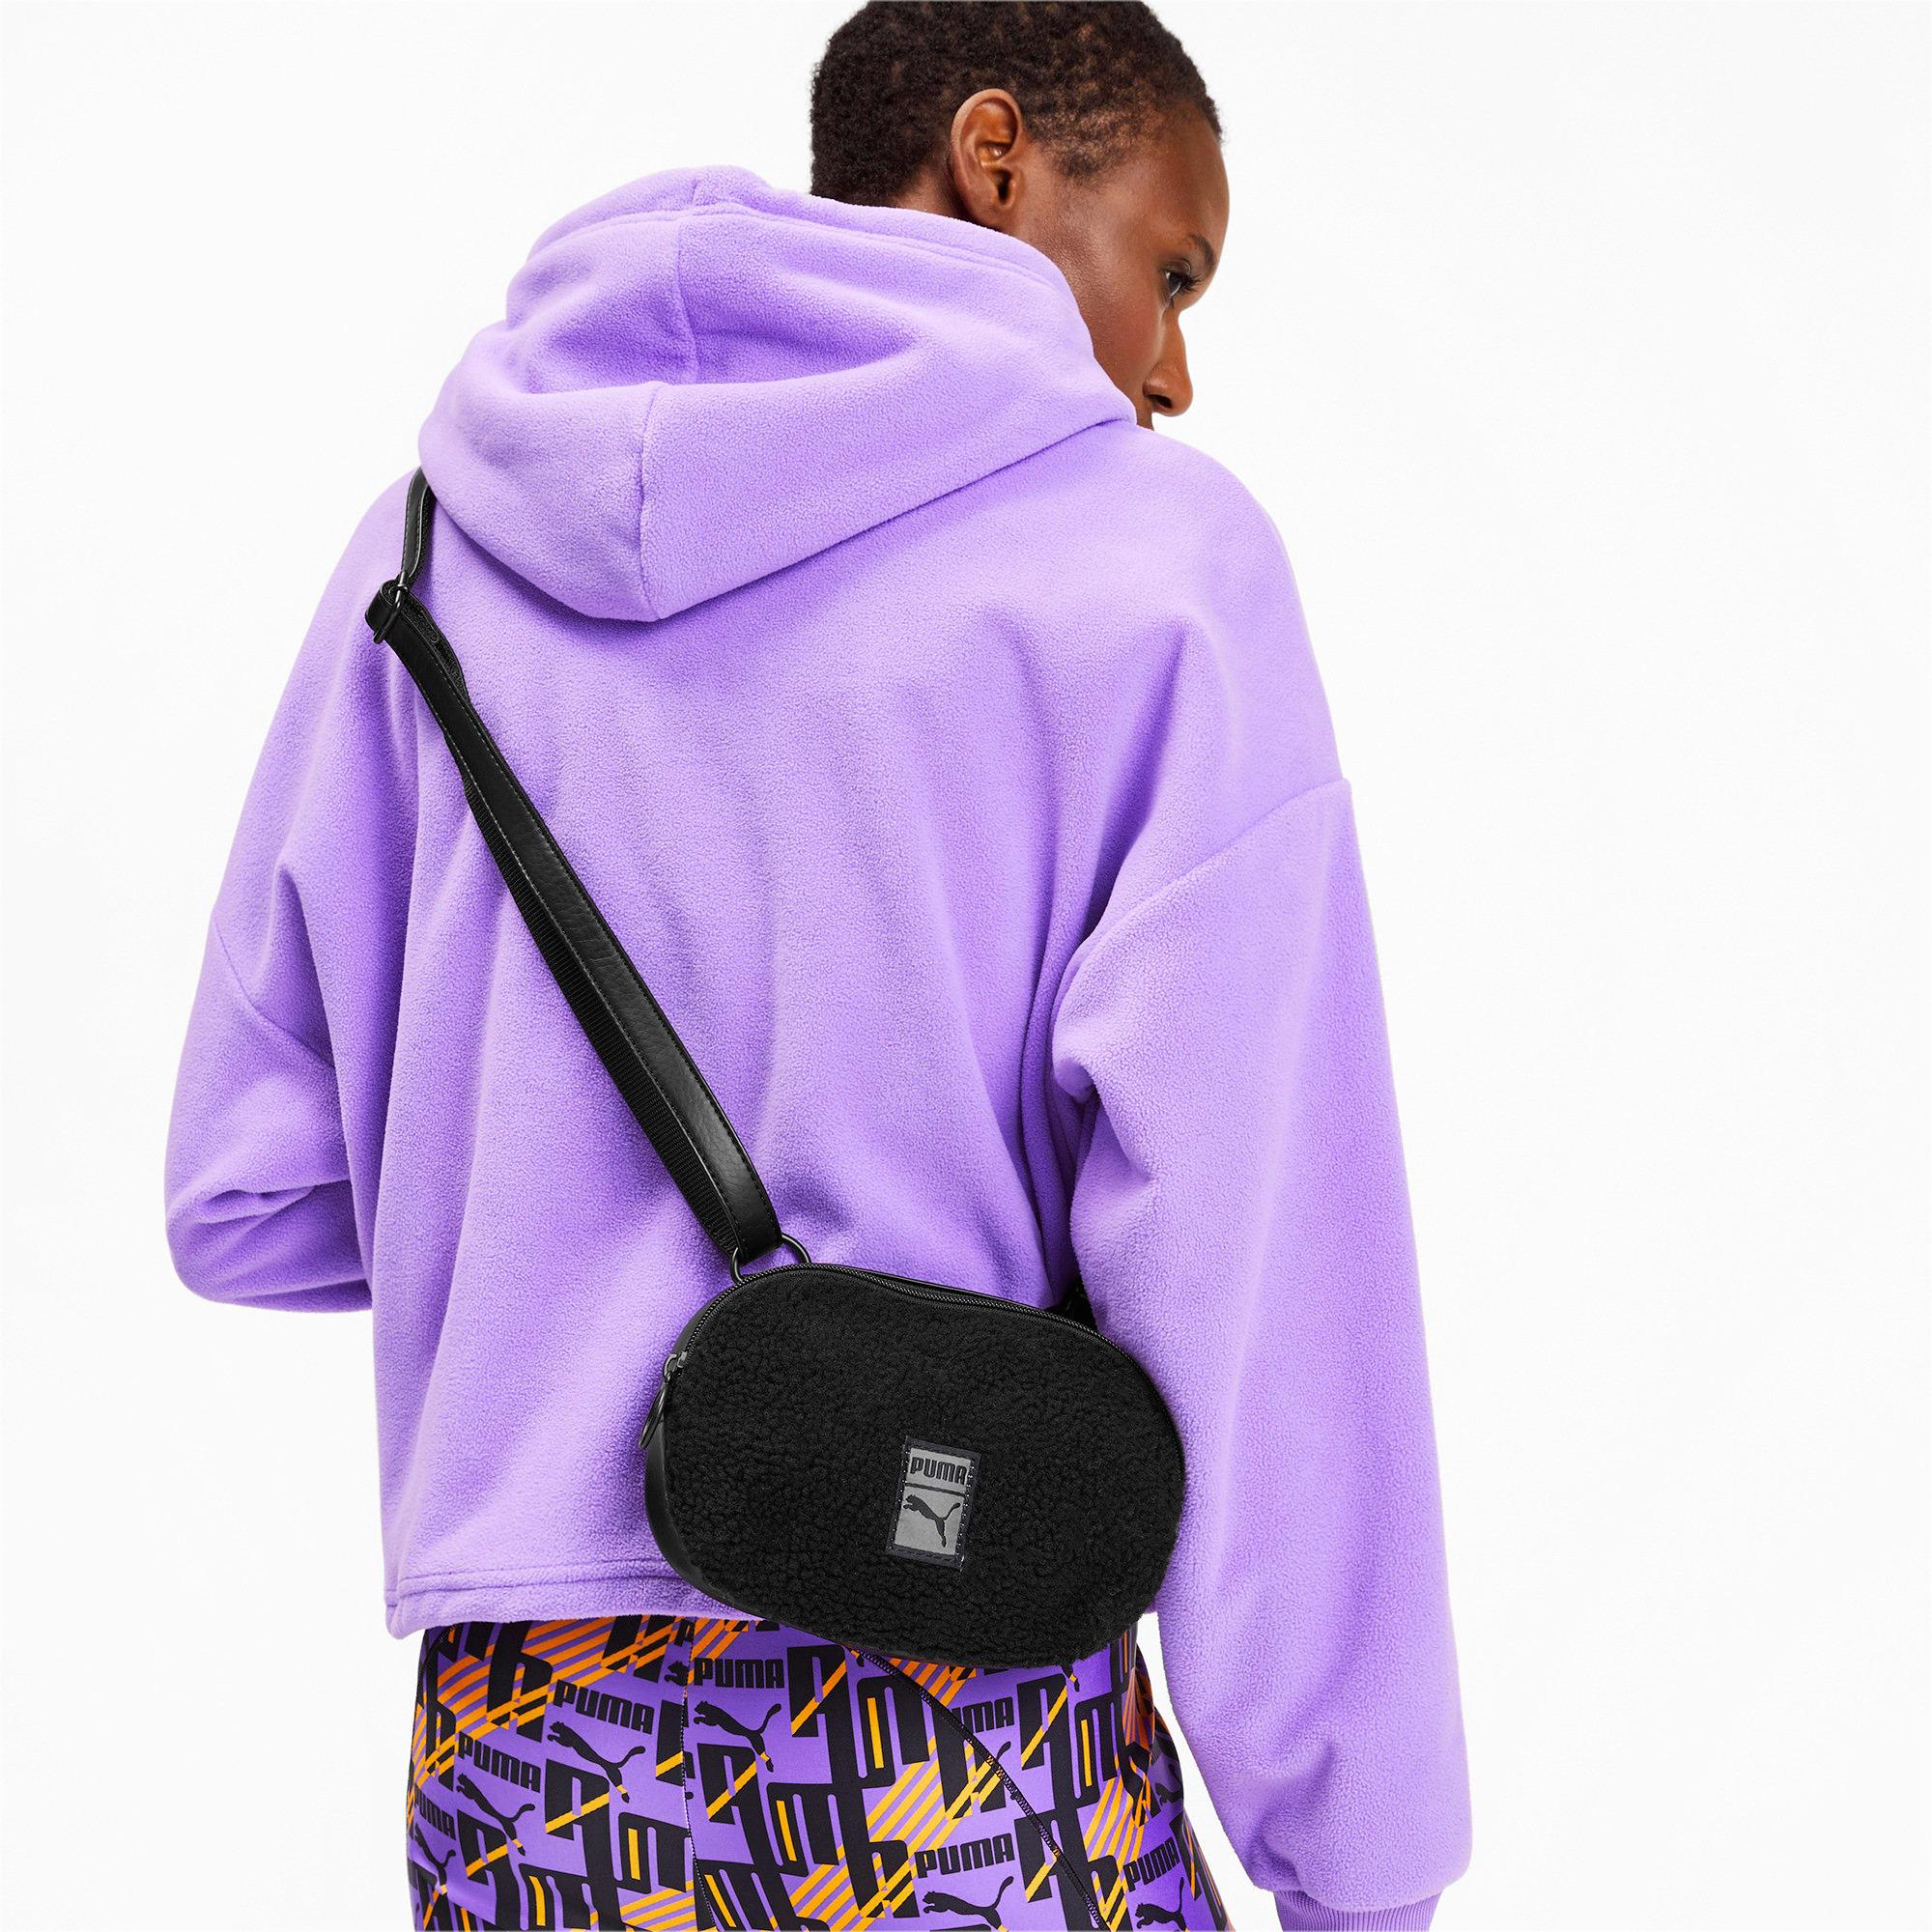 Thumbnail 2 of Prime Time Crossbody Bag, Puma Black-Puma Black, medium